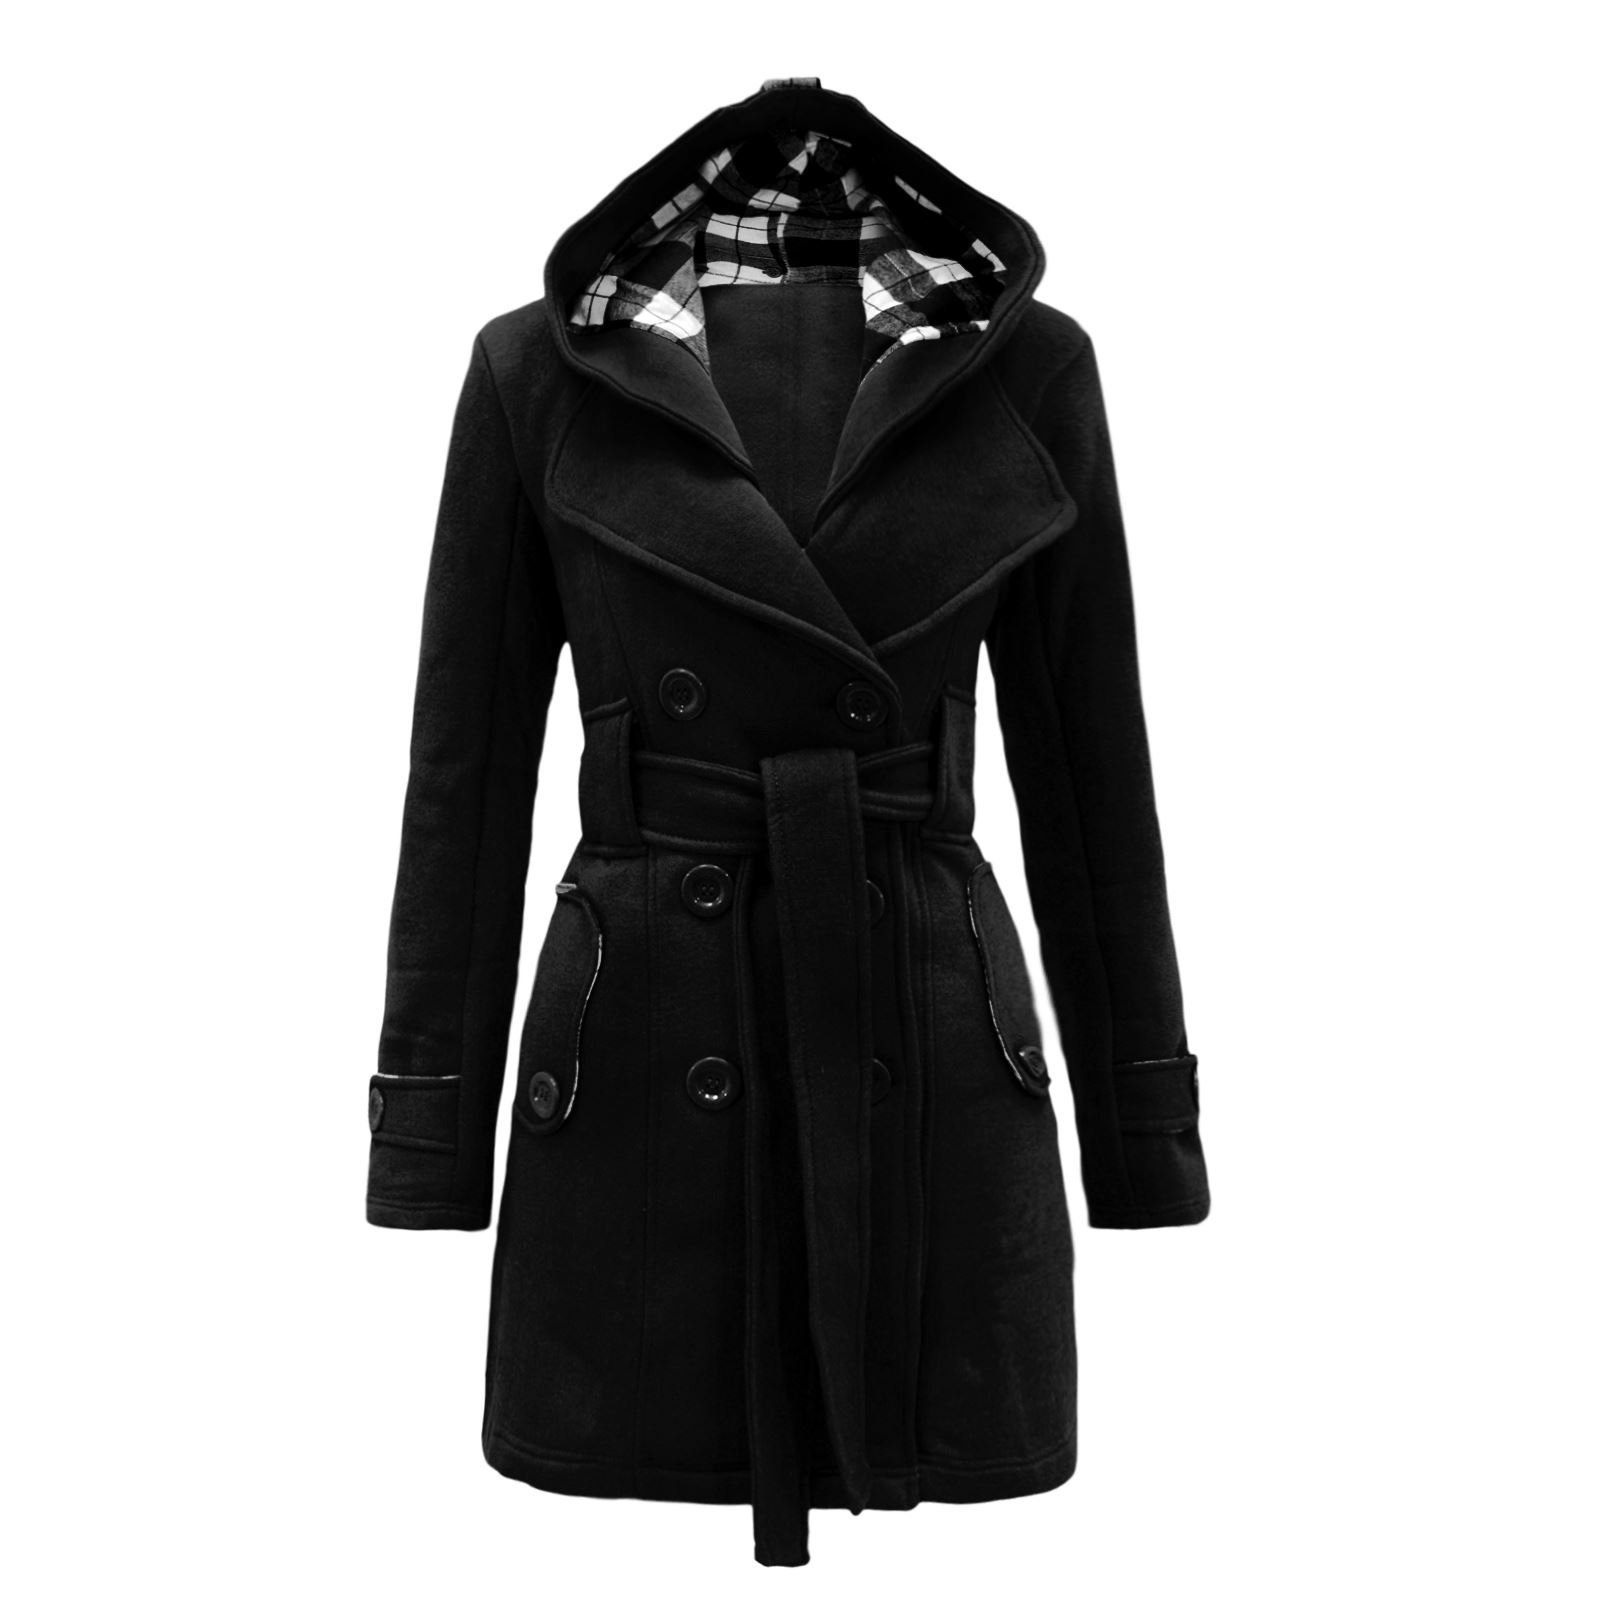 Envy Boutique Women's Belted Button Coat Hood Jacket Top Black 8